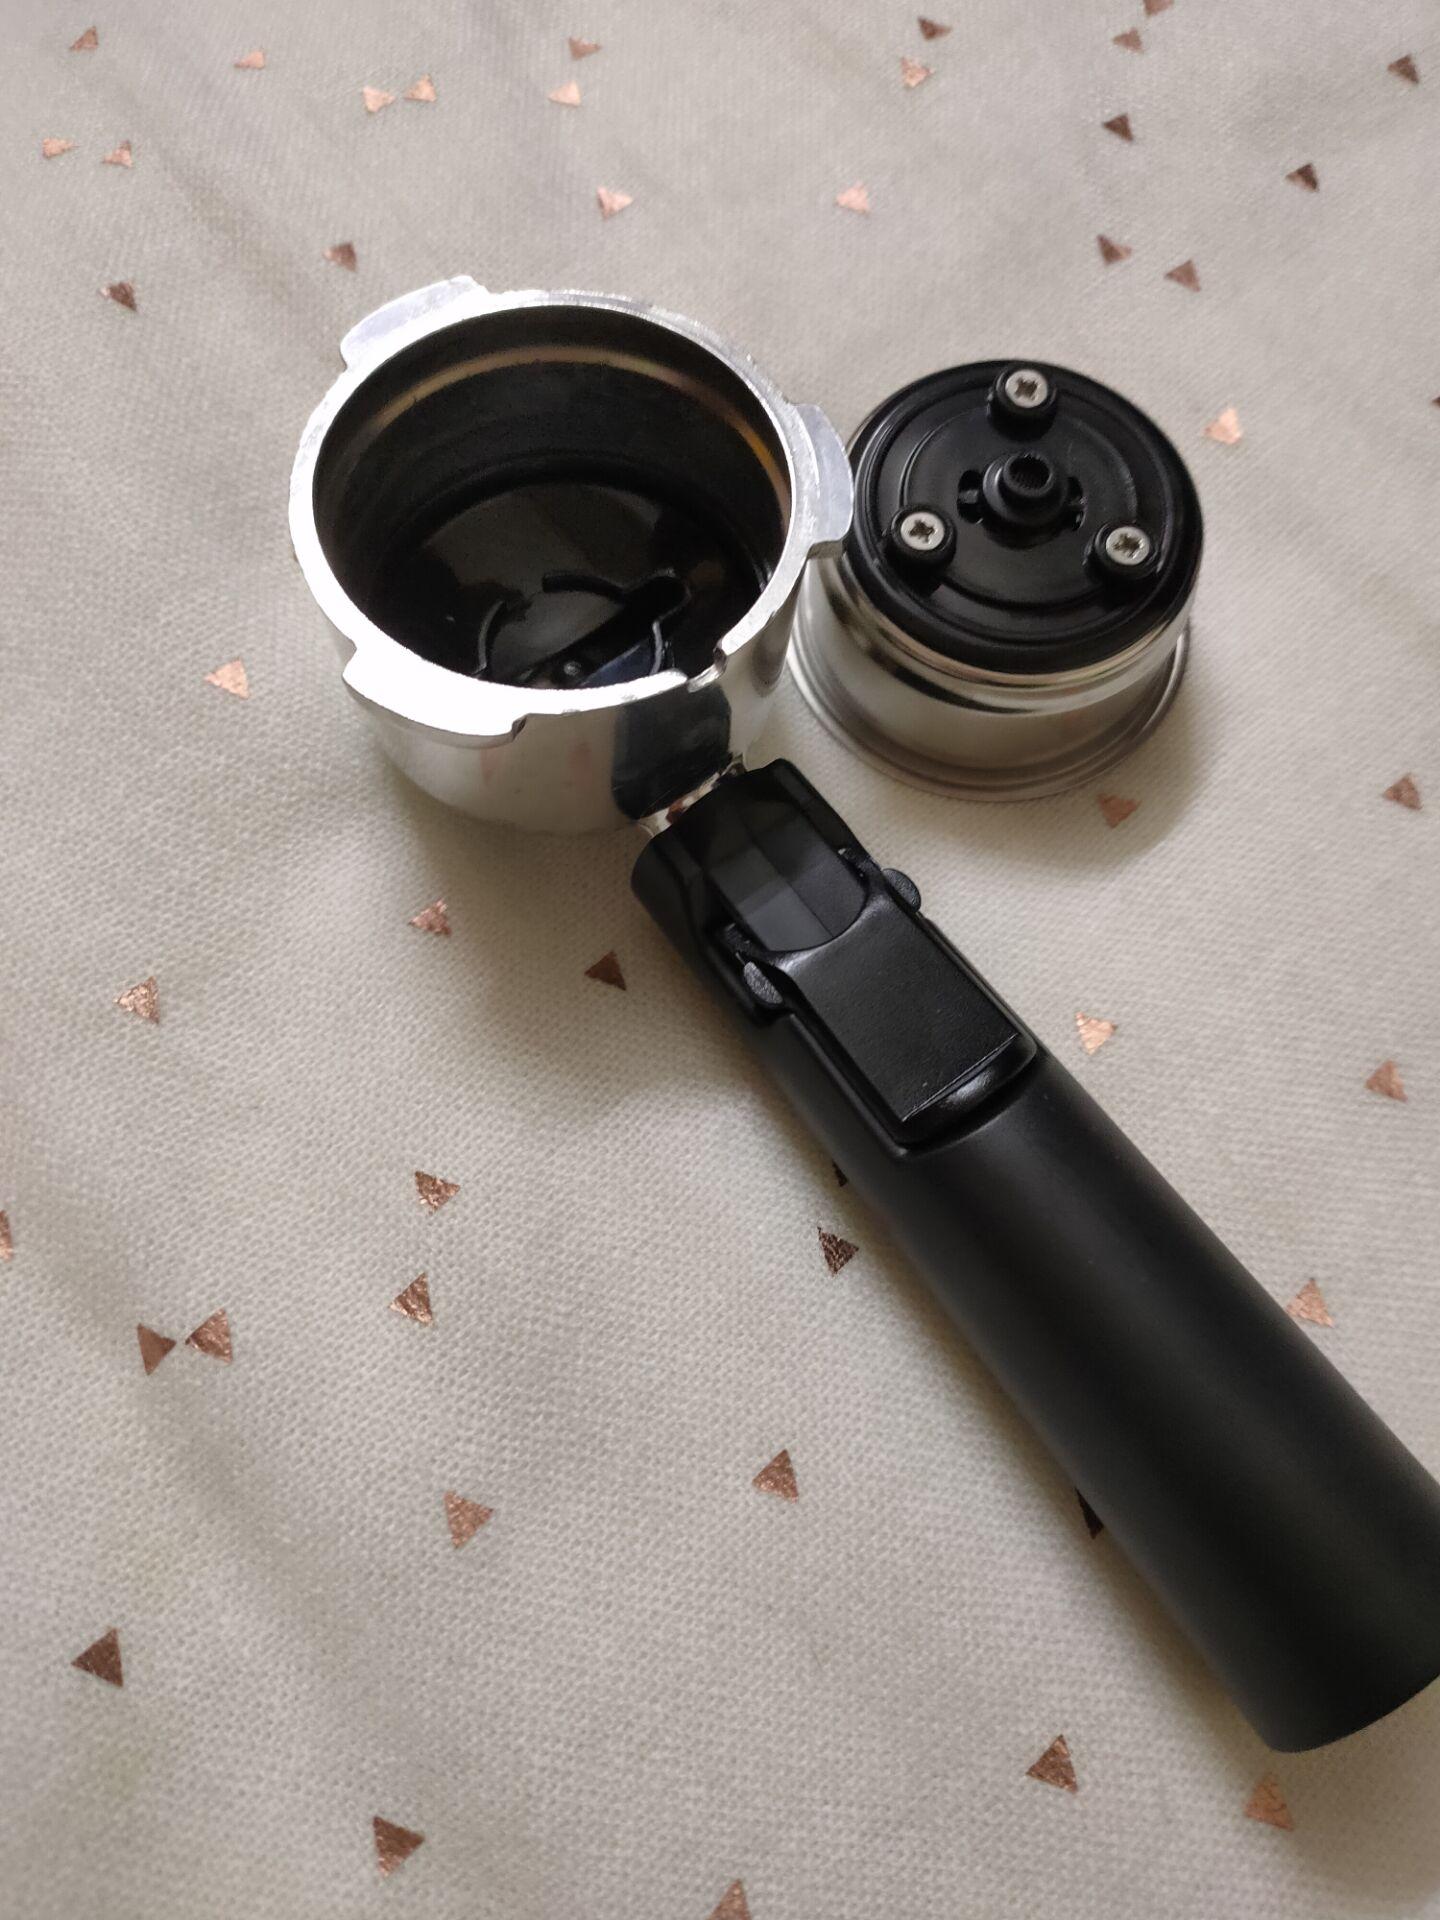 Original Filter Handle For Household Coffee Machine Parts KF6001 KF7001 KF8001 KF5002 KF500S CM4621 CM4216